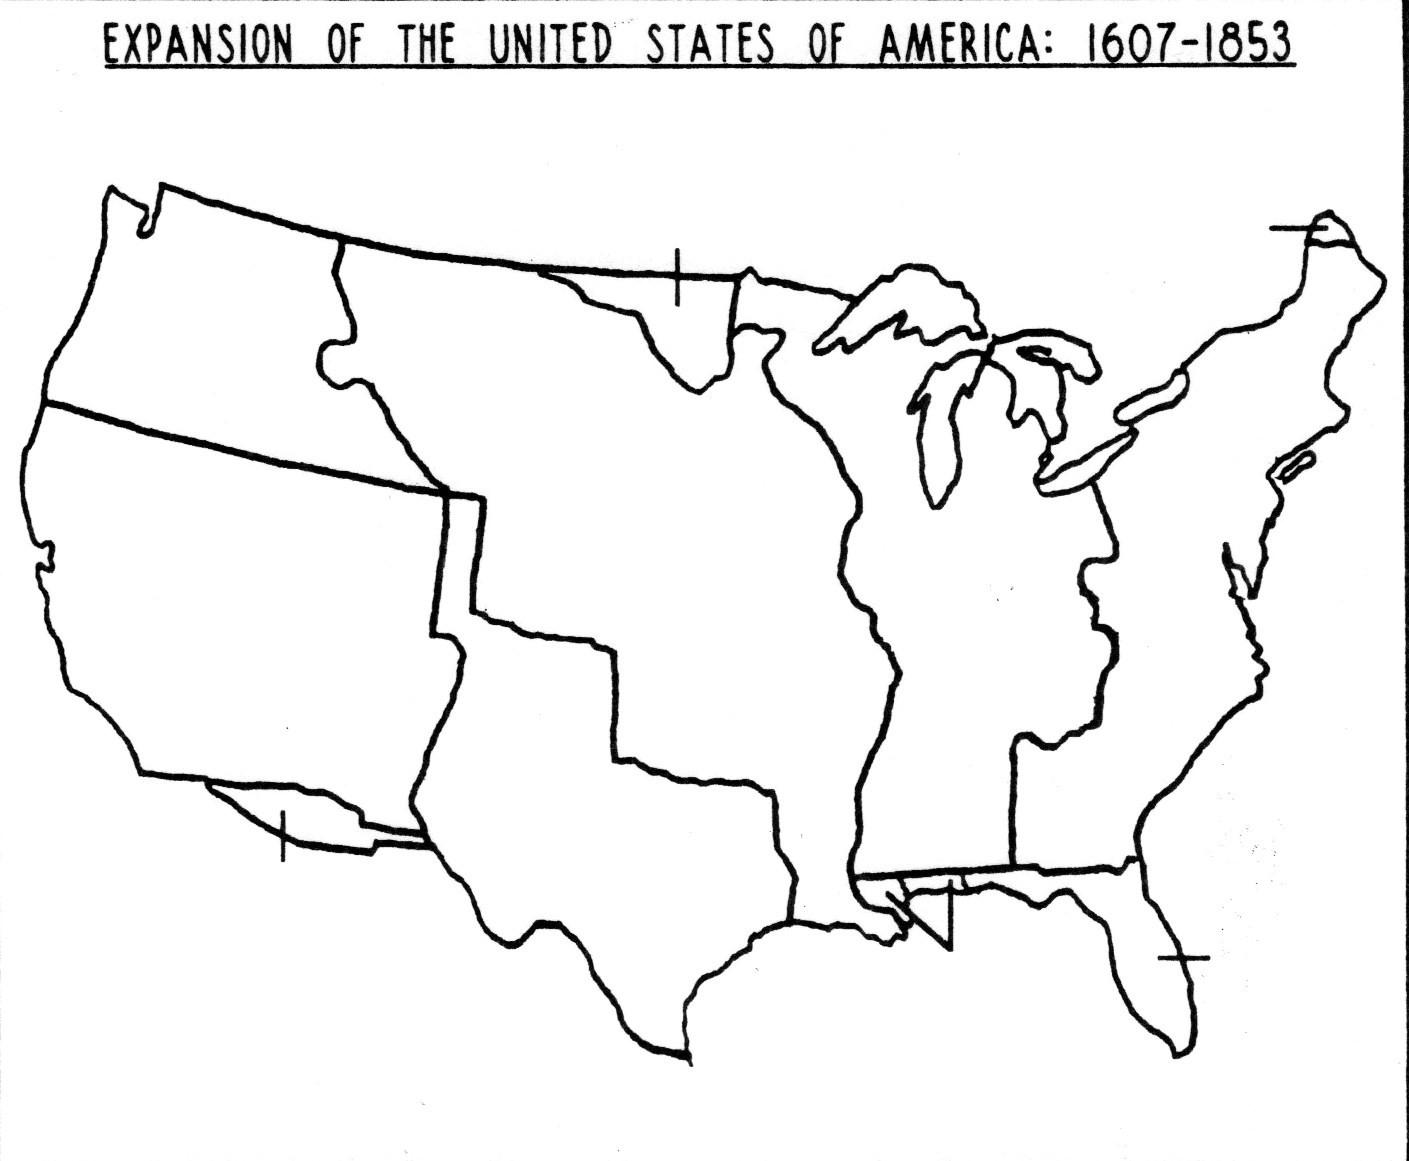 Blank US Map World Regional Printable Blank Maps Royalty Free Jpg - Printable us state map blank